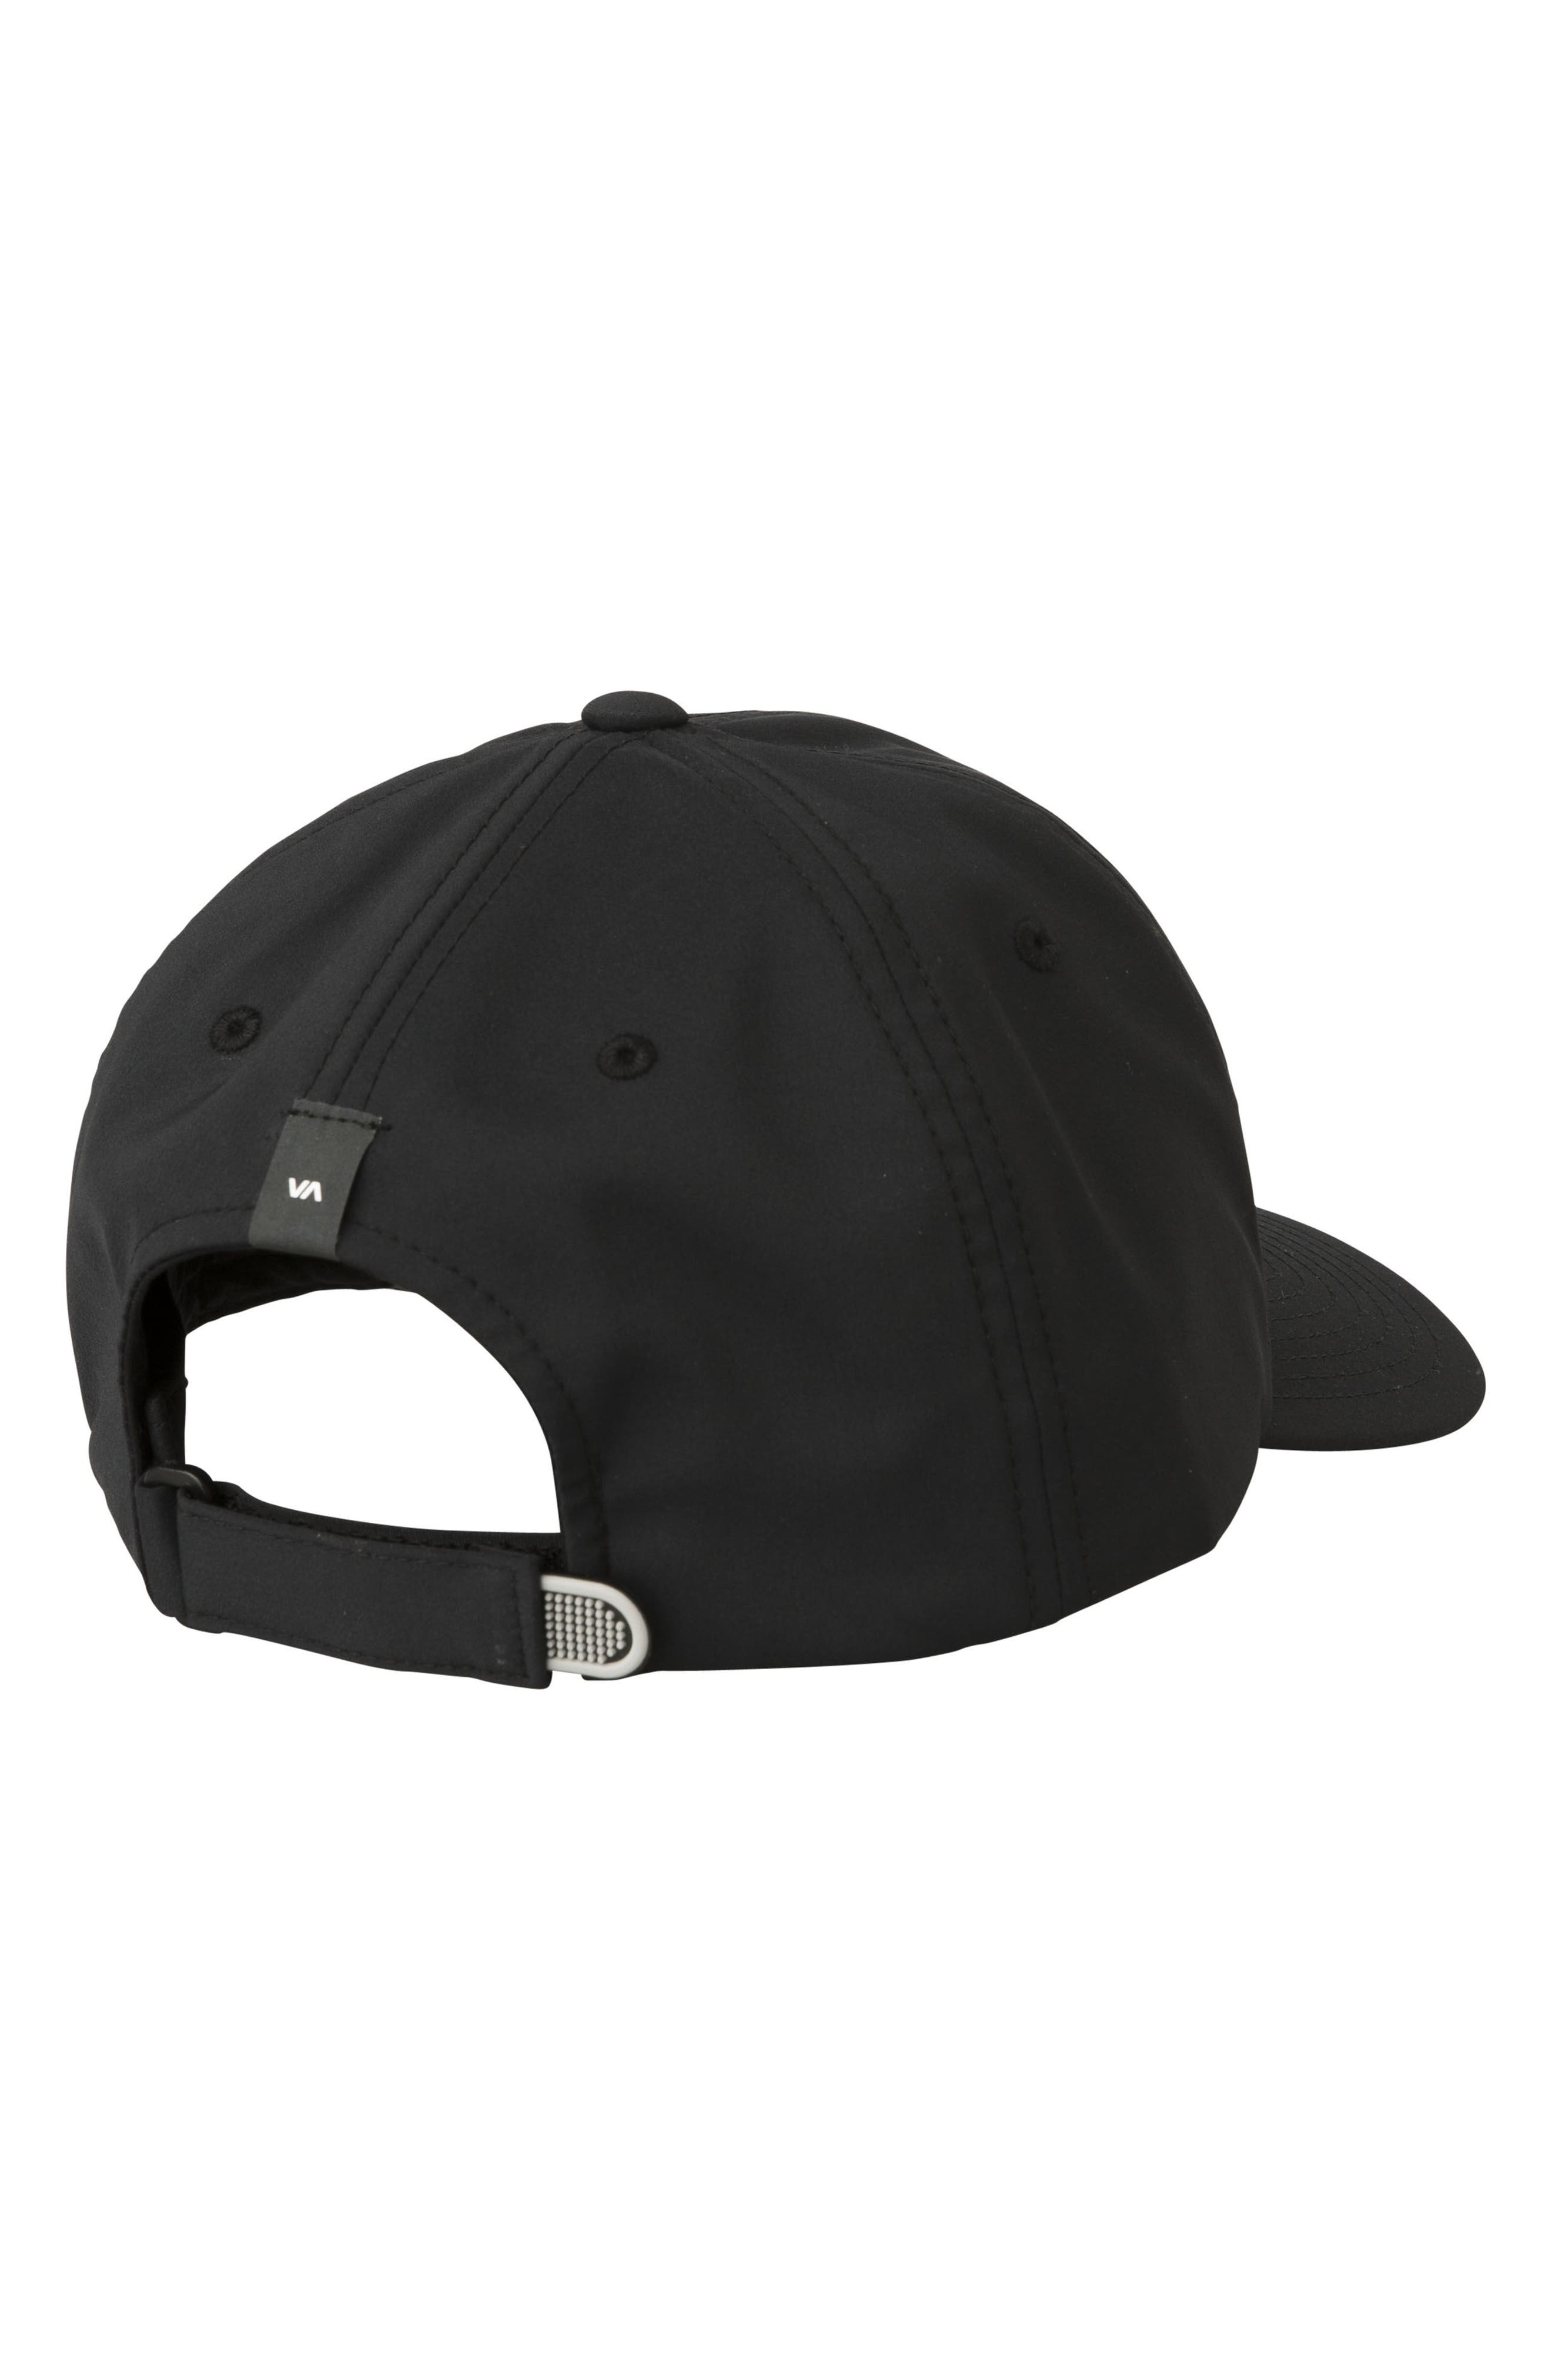 RA Sport Trainer Baseball Cap,                             Alternate thumbnail 2, color,                             Black